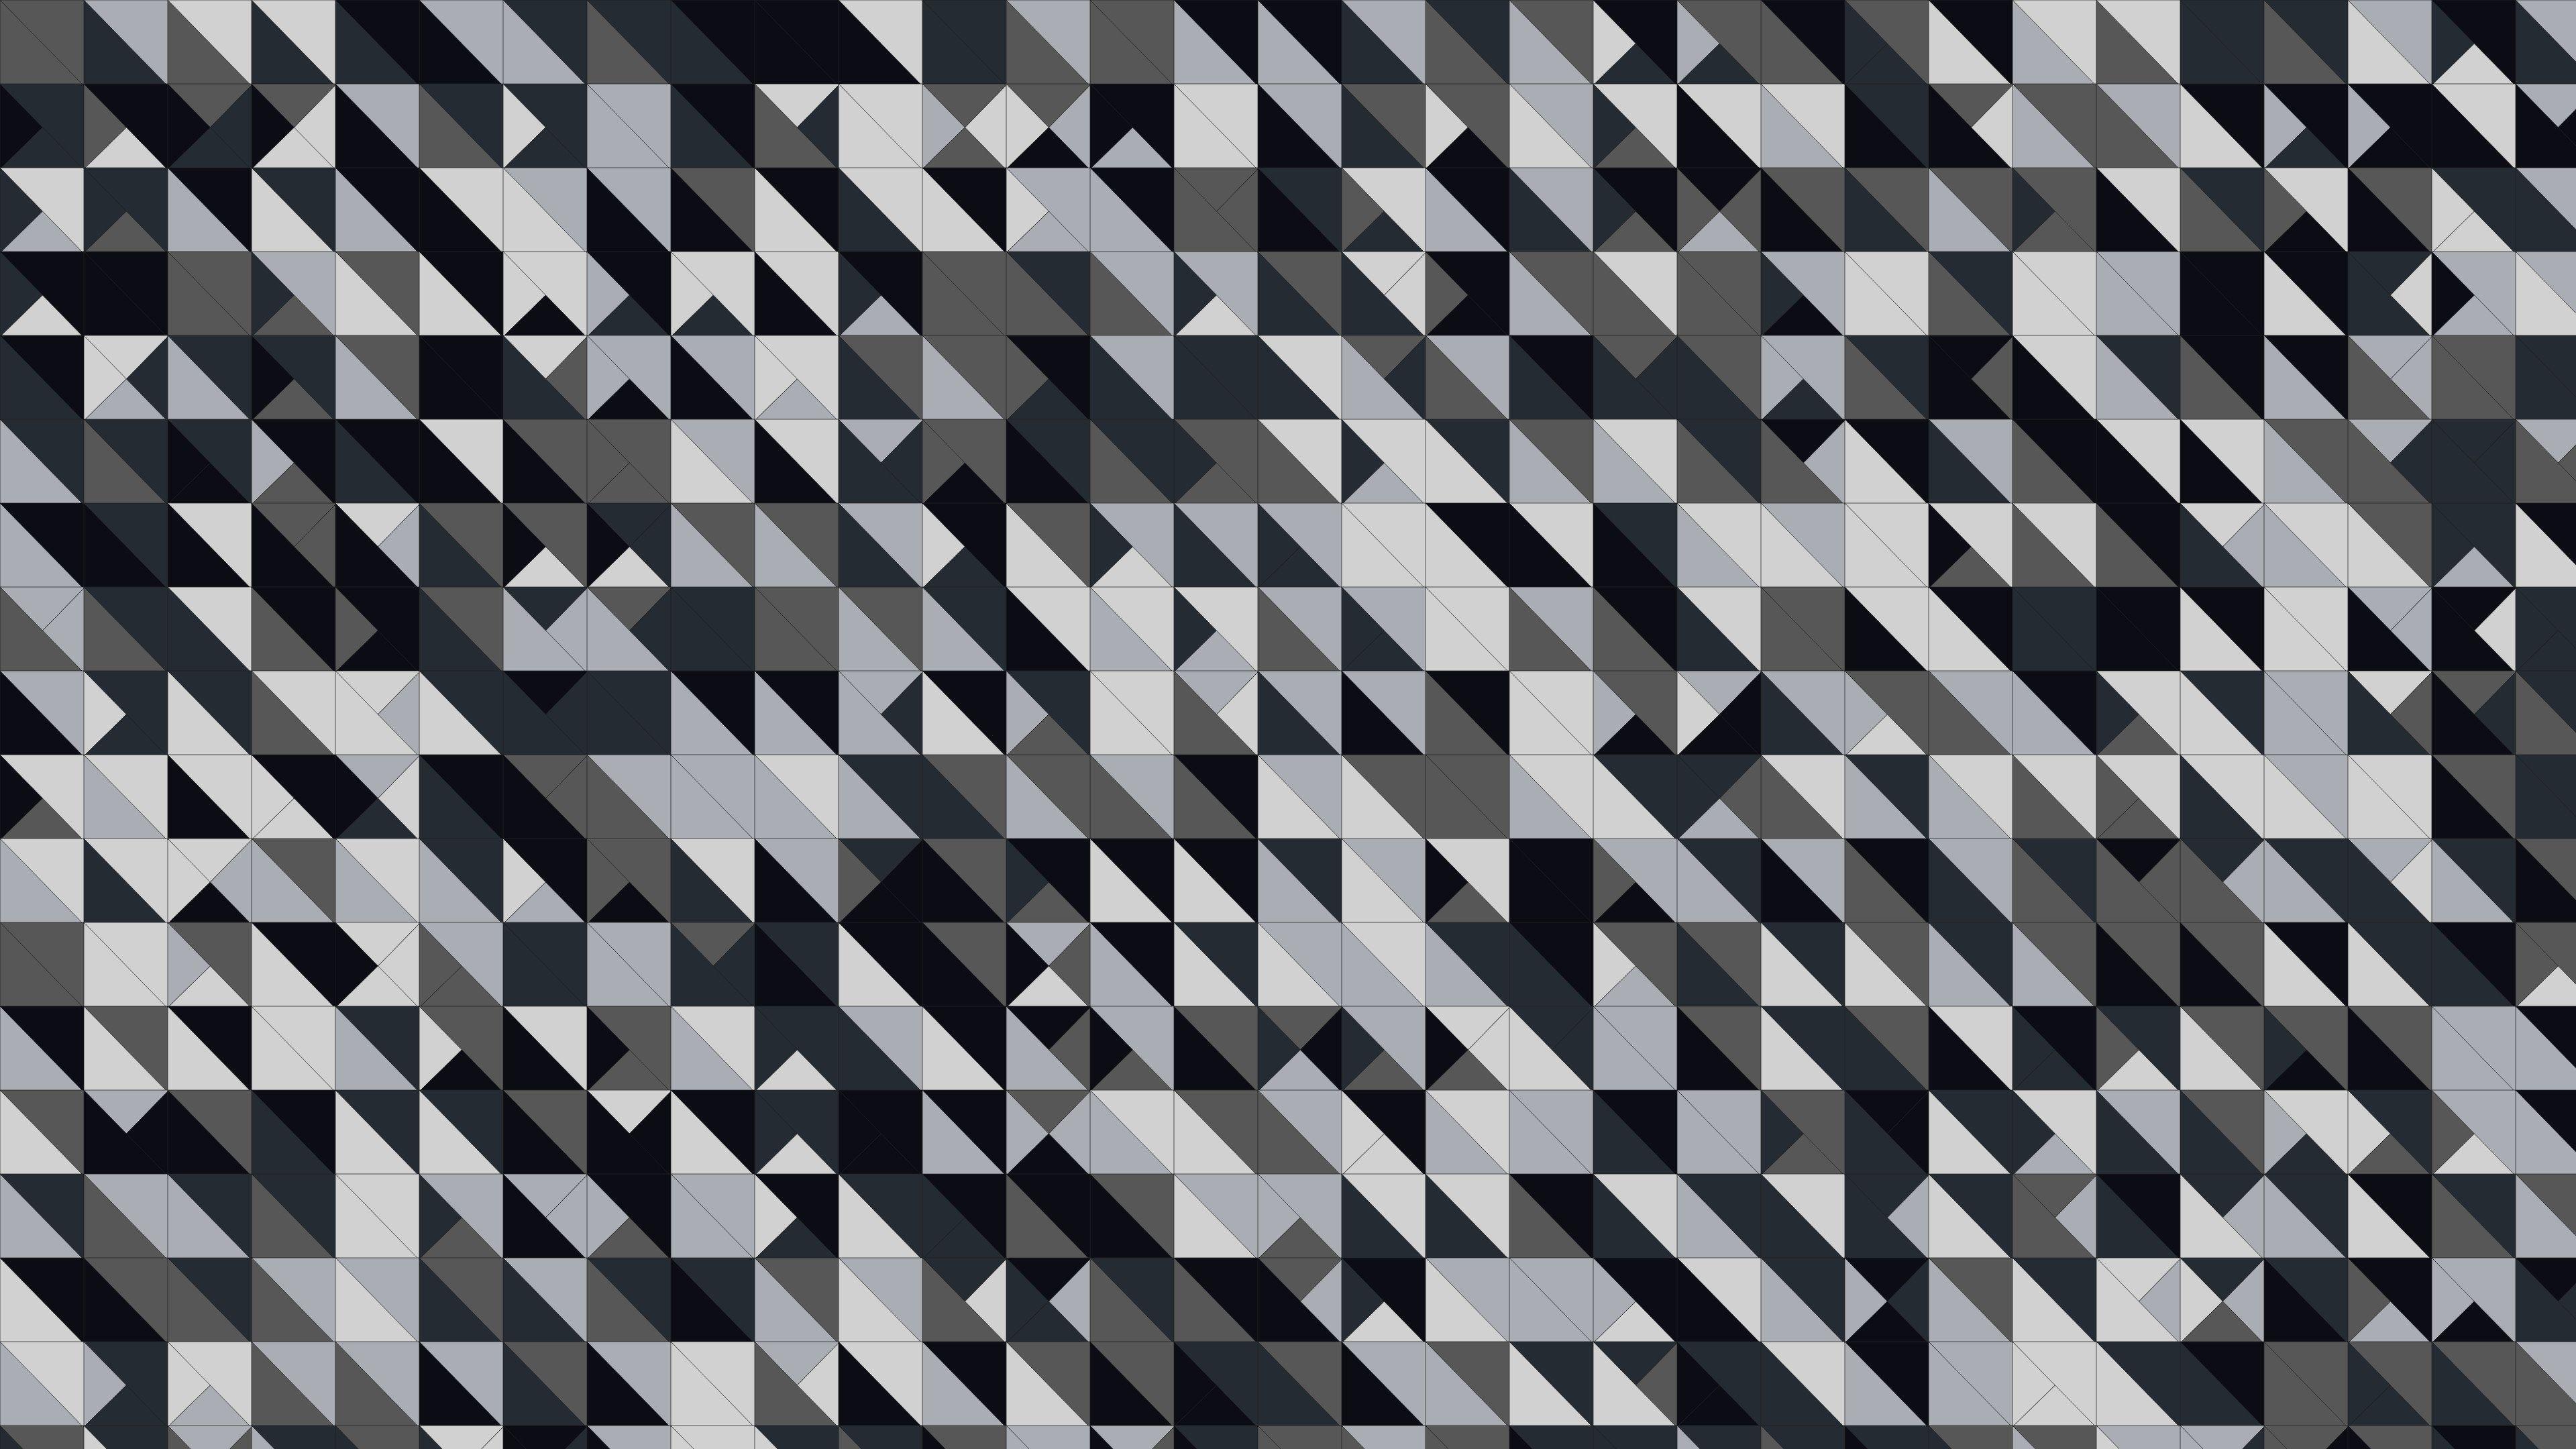 4k Resolution Black Pattern Wallpaper 4k Allwallpaper Black And White Abstract Black Background Wallpaper Black Pattern Wallpaper